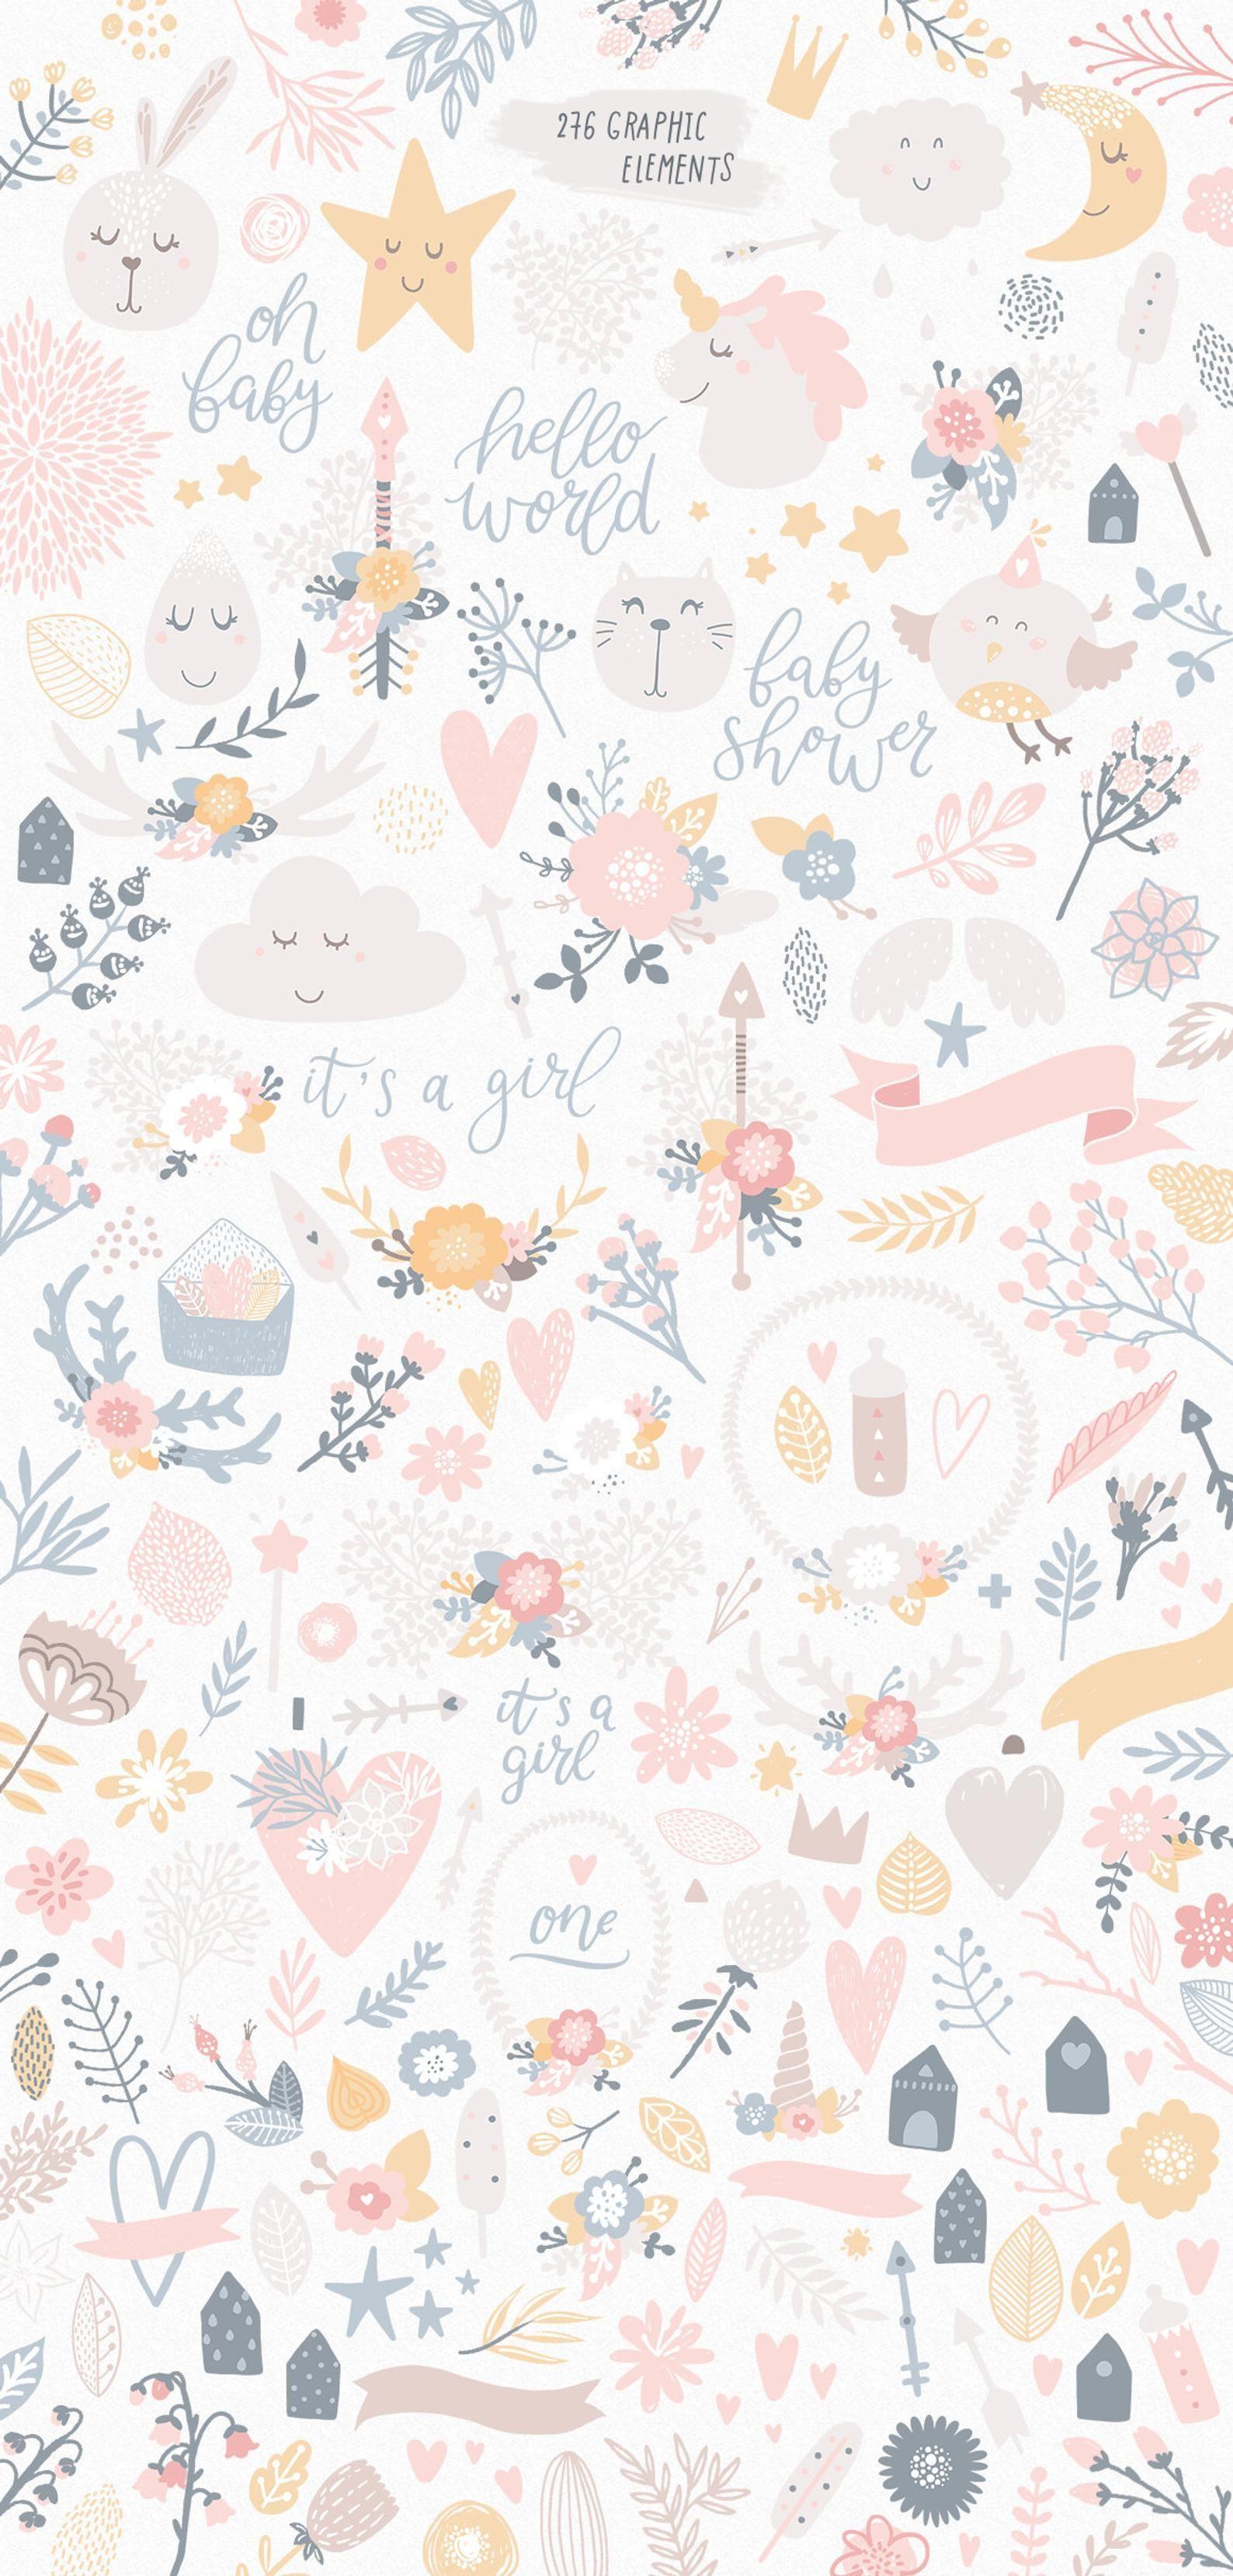 Unicorn clipart Baby girl patterns Nursery clip art Girl poster Baby shower cards It's a girl Digital paper flowers Alphabet Baby girl